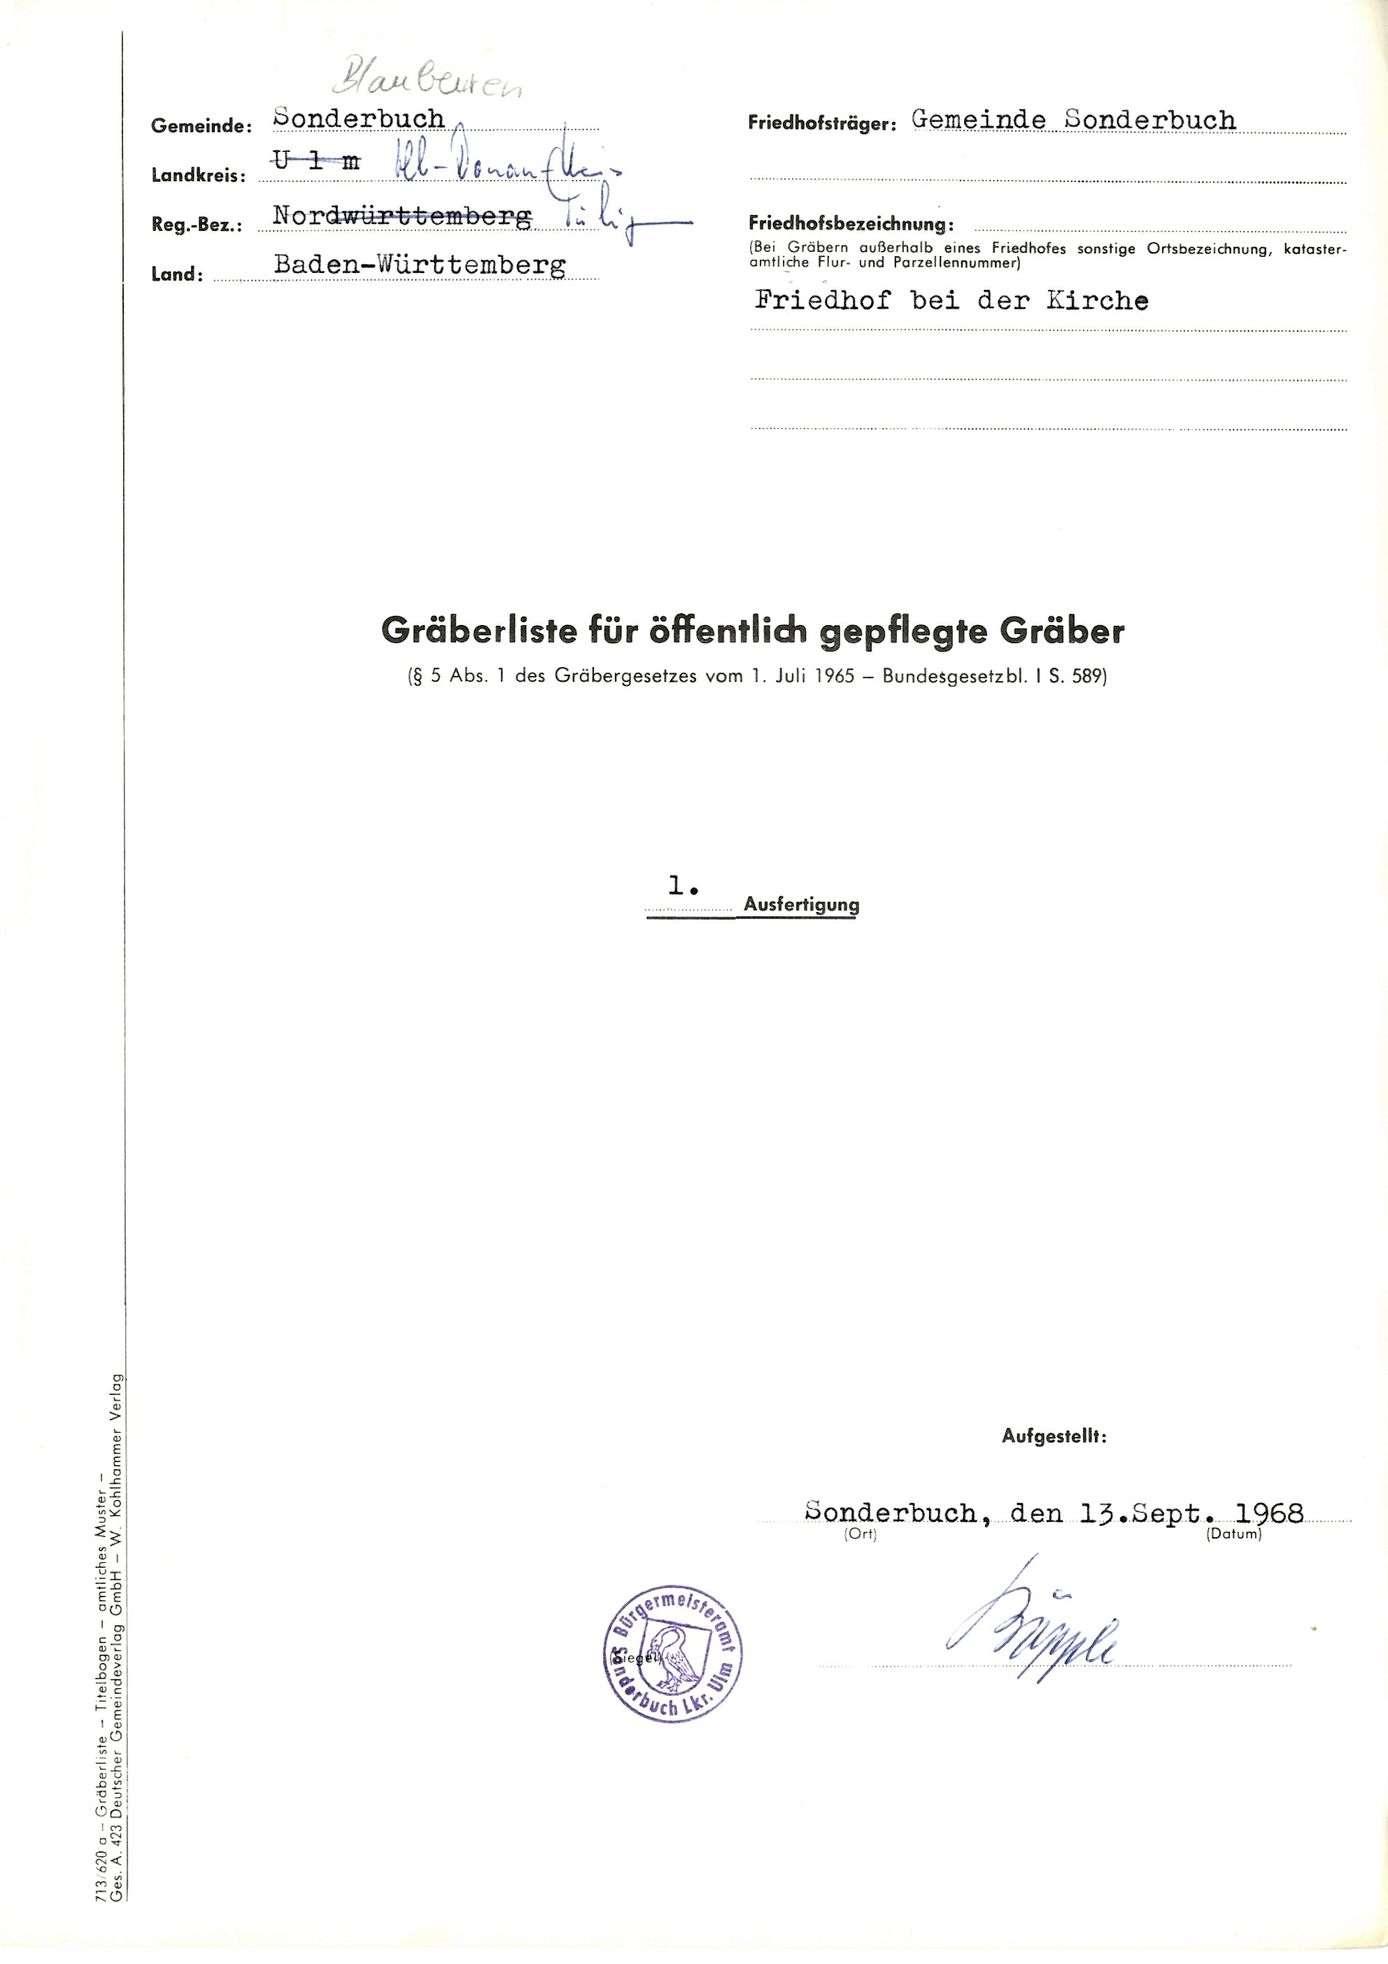 Sonderbuch, Bild 1